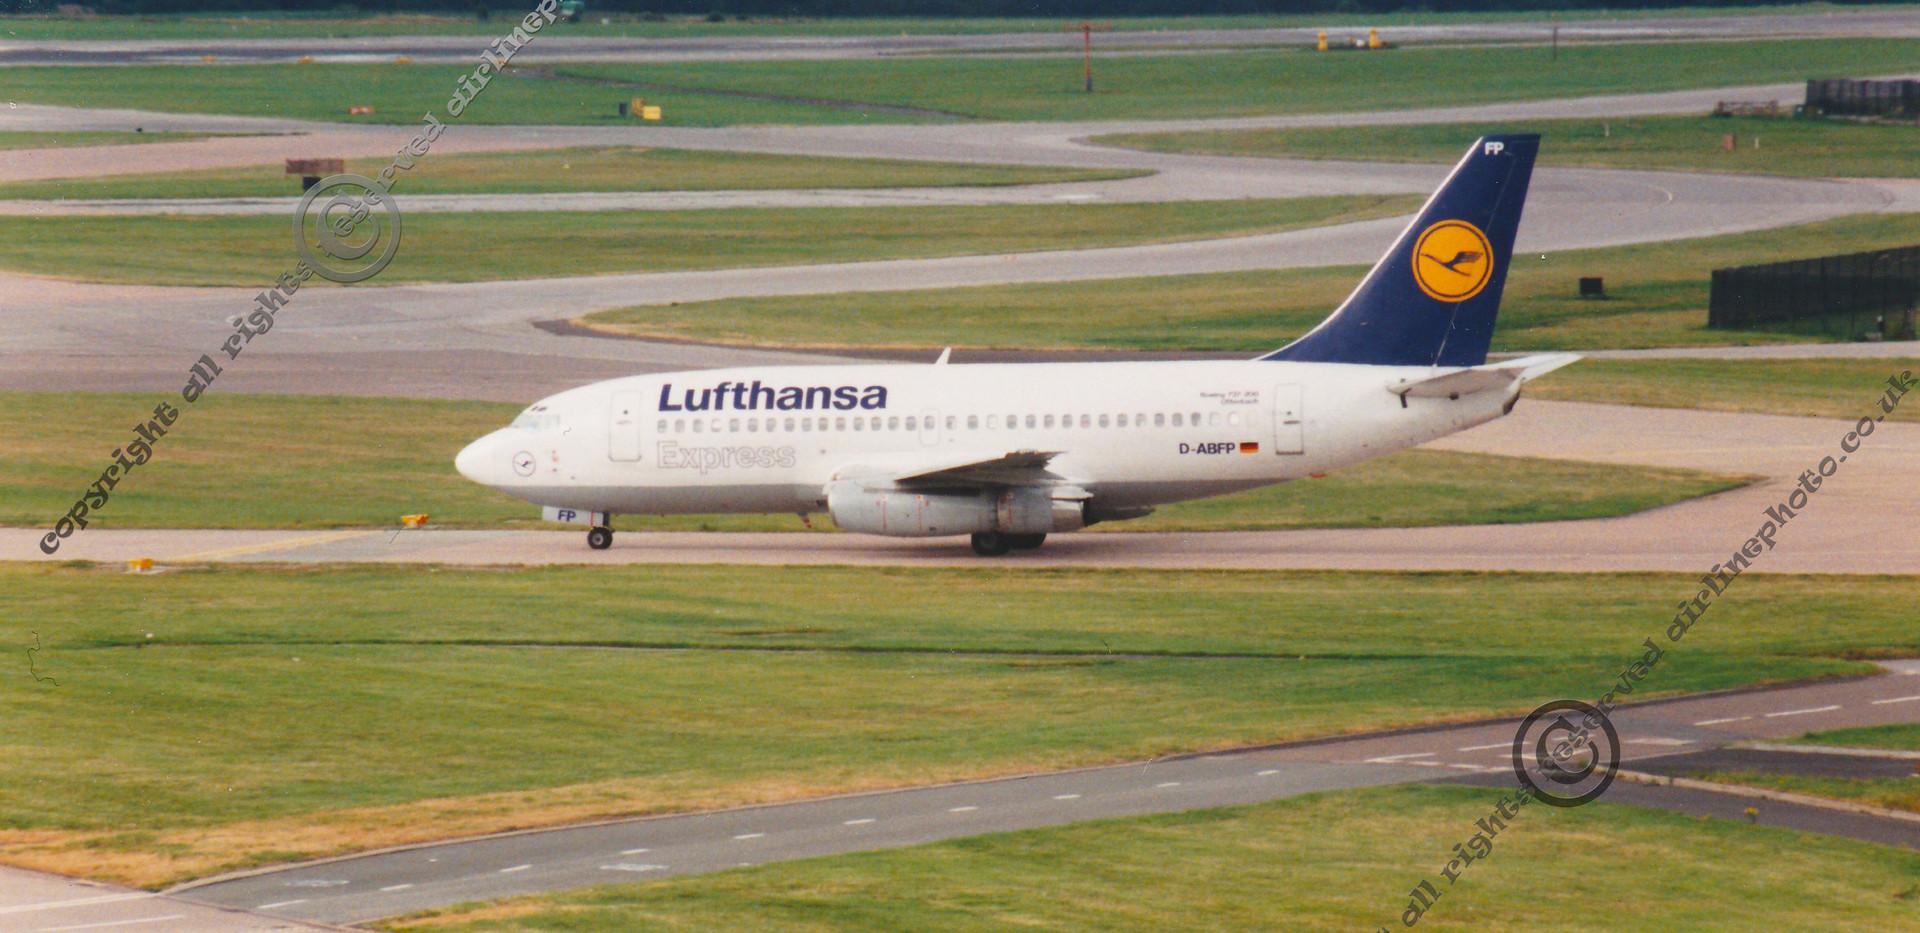 D-ABFP-Lufthansa-737-230.jpg